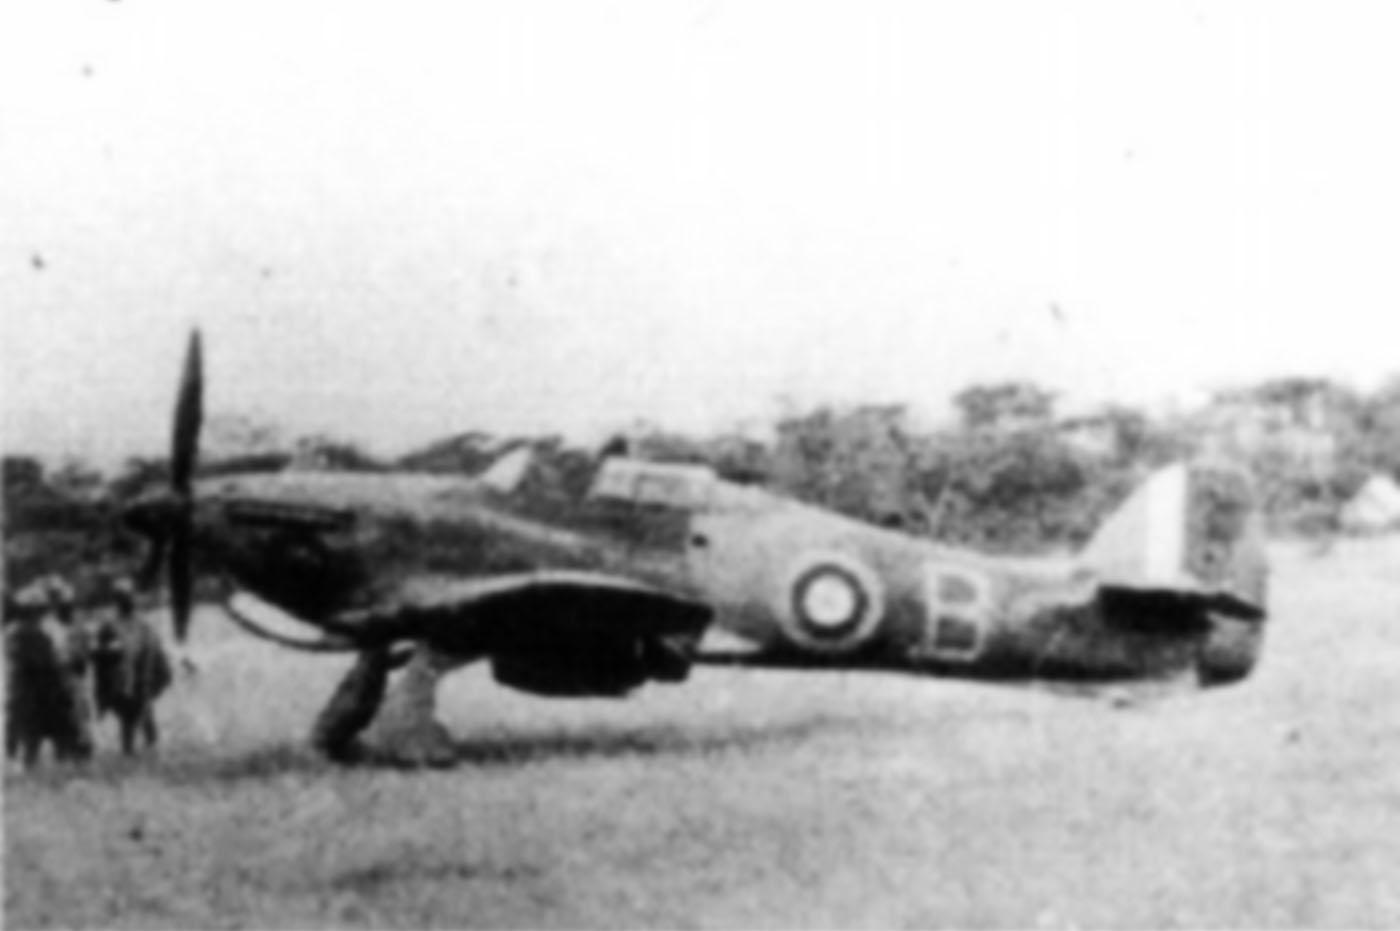 Hurricane I Trop SAAF 3Sqn B 290 Lt Albertus Venter Addis Abeba Abyssinia May 1941 01